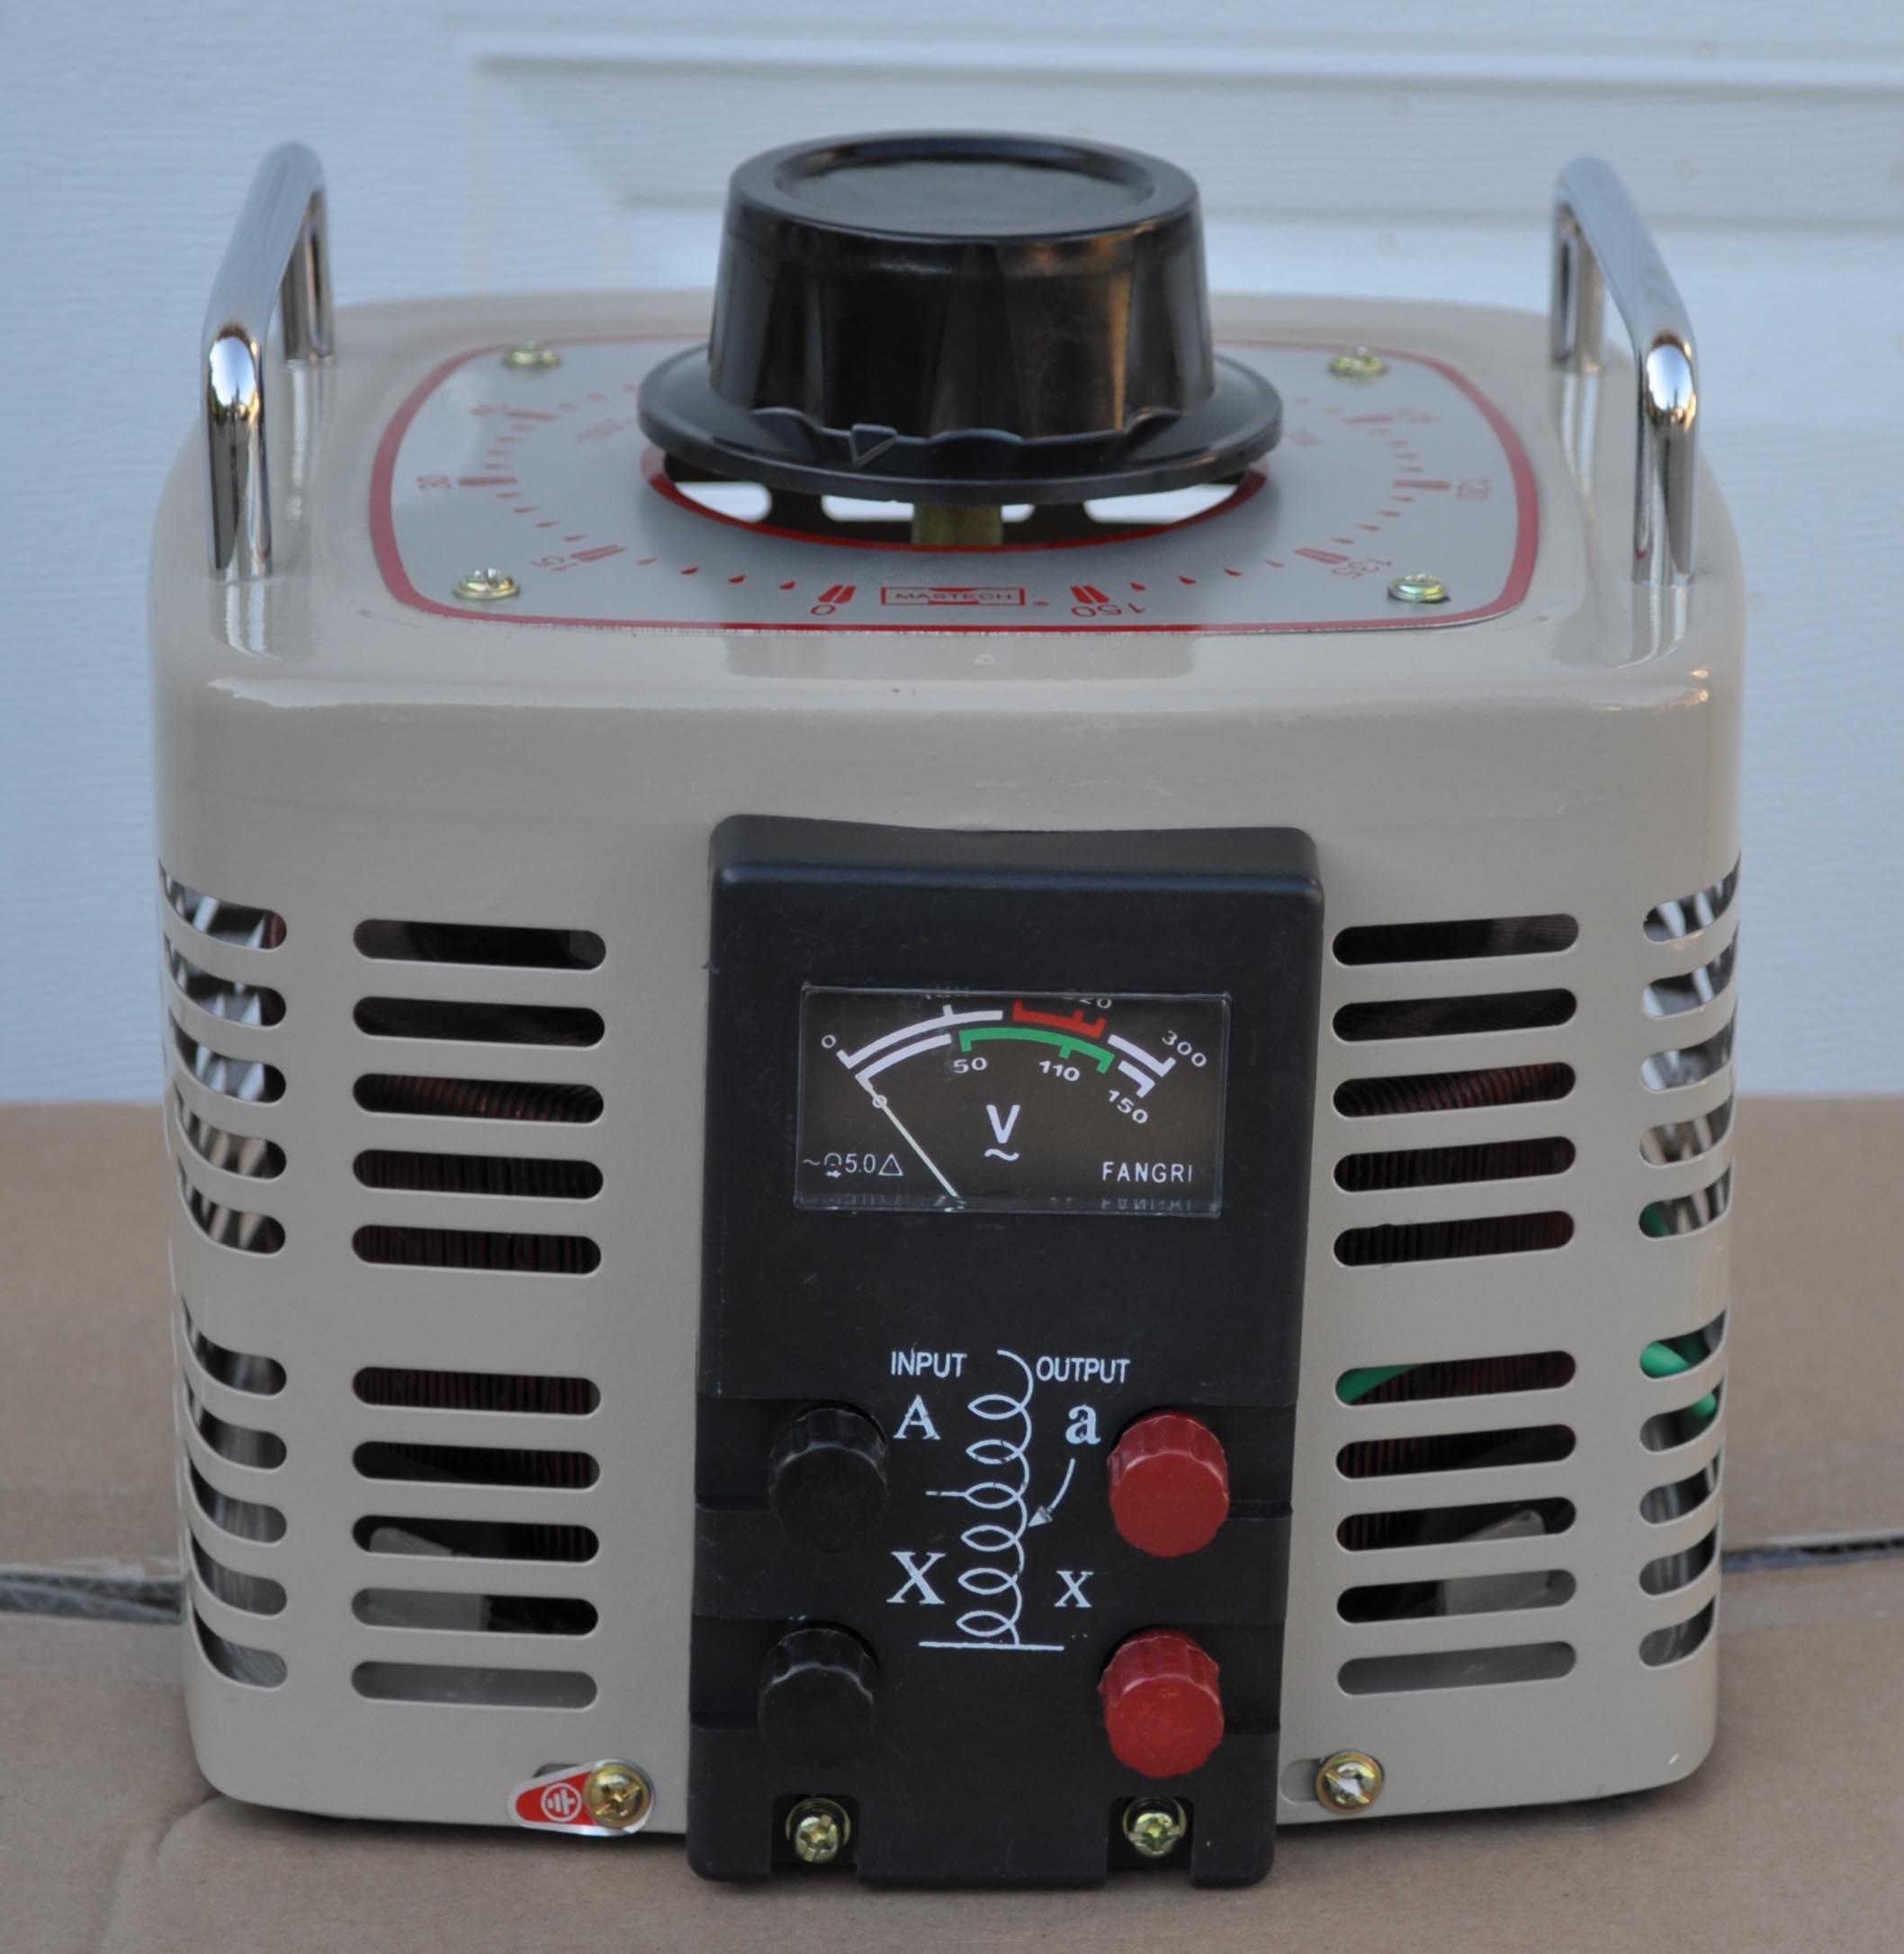 Variac Variable Transformers Voltage Regulators Tdgc2 ...